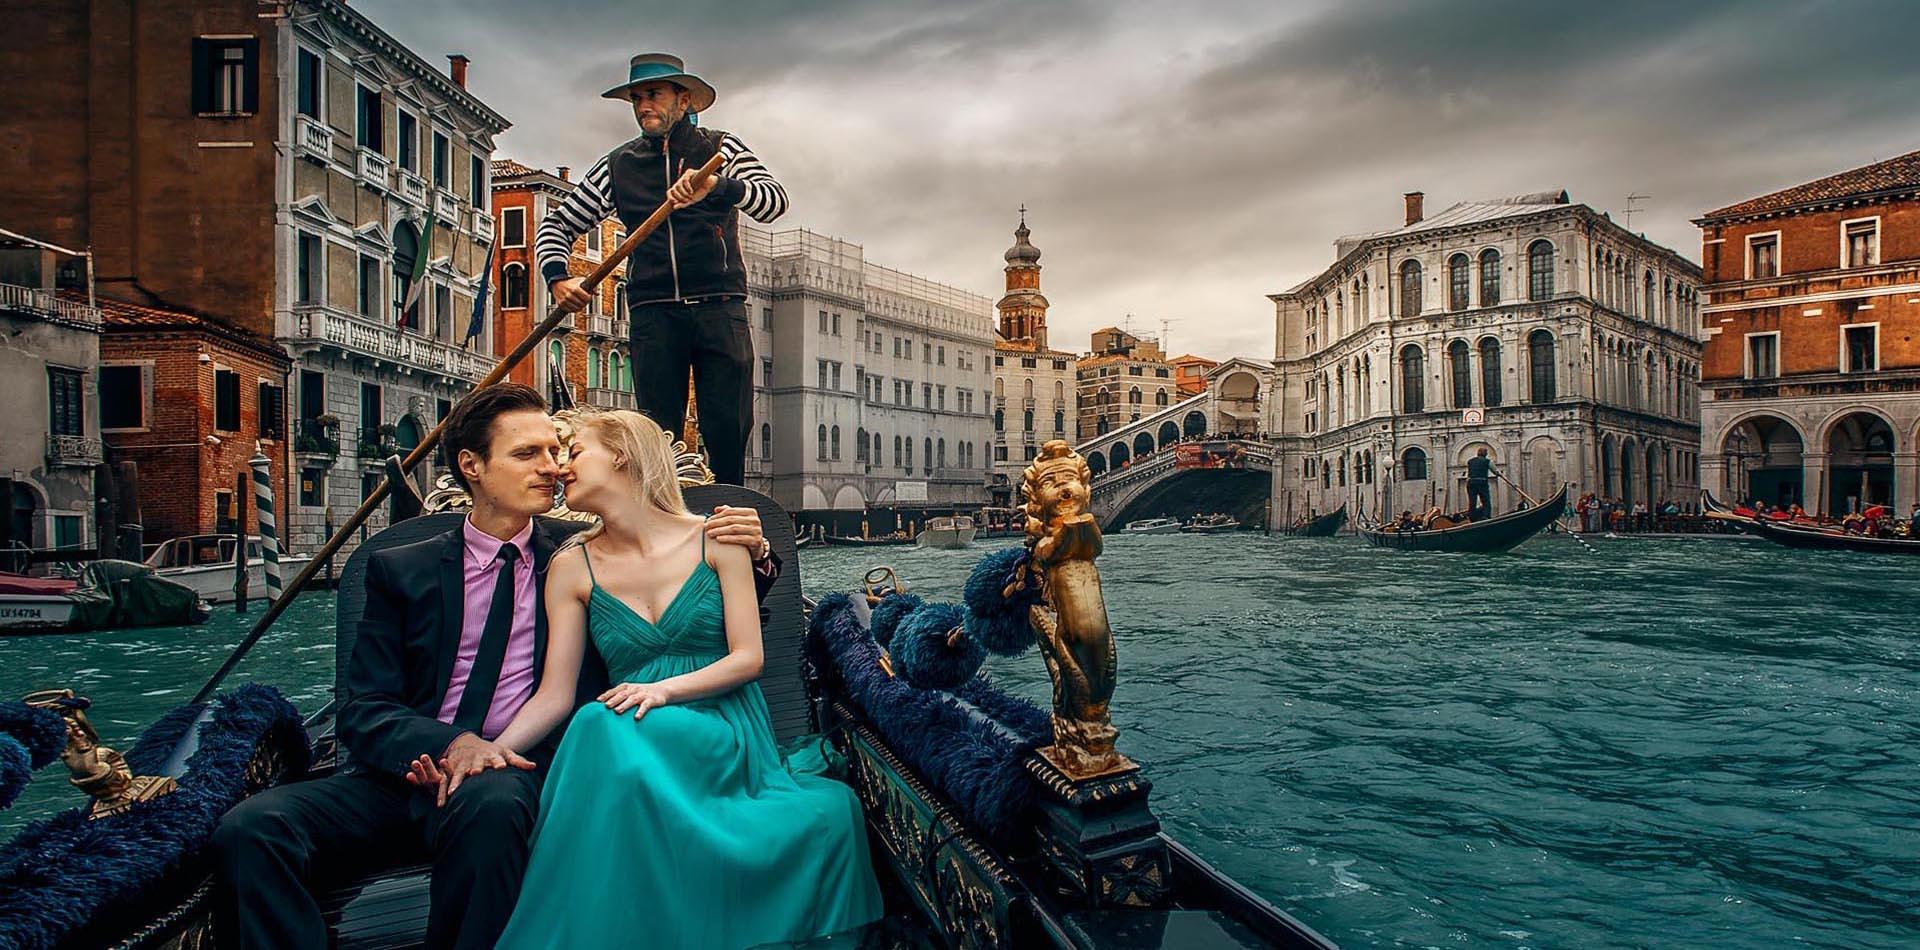 Verlobungsshooting im Venedig